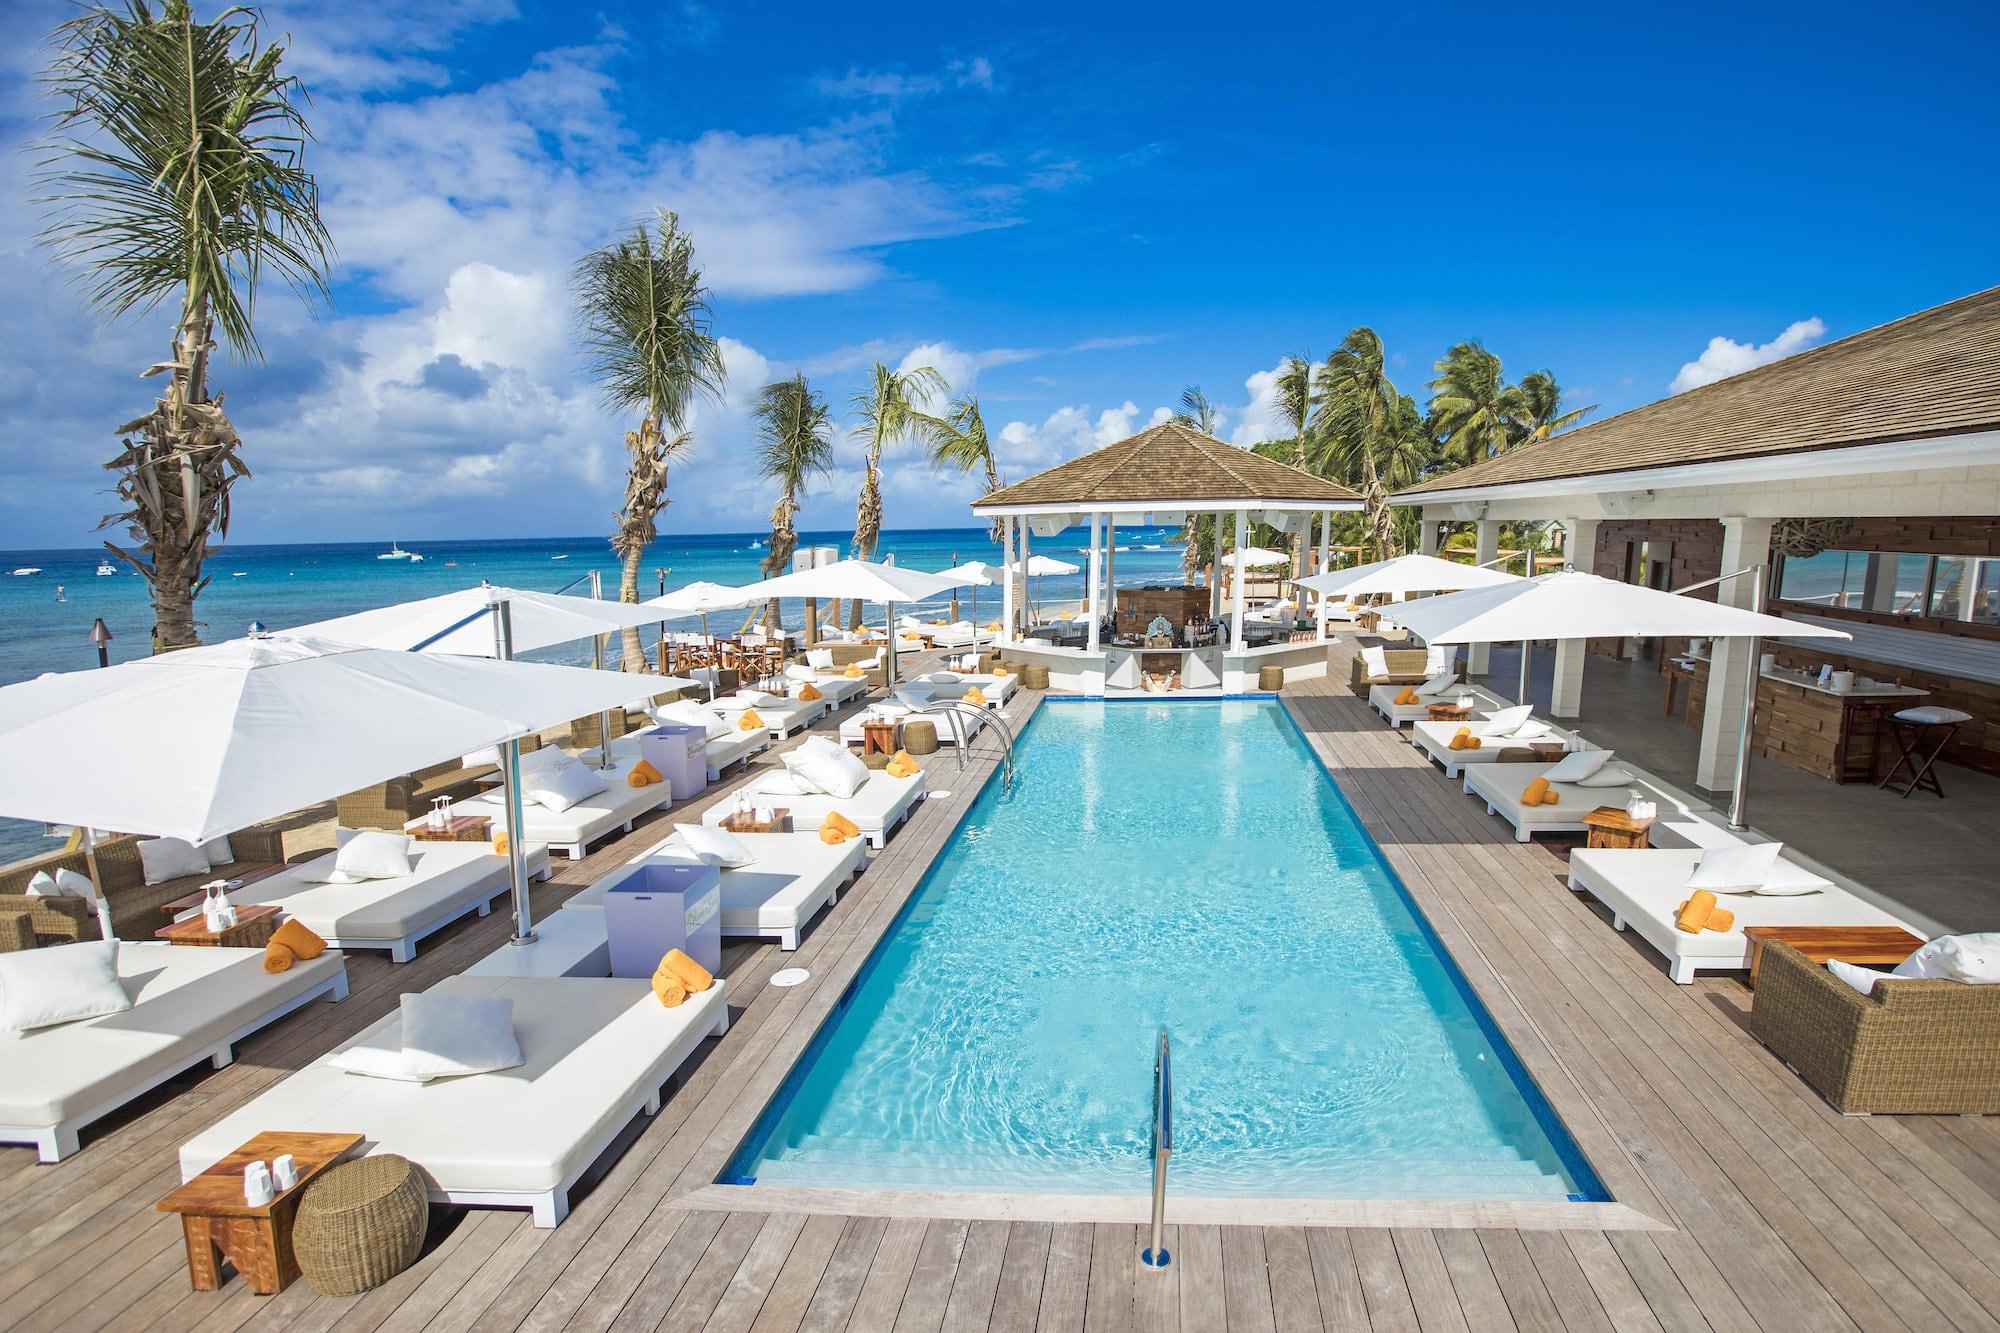 Nikki Beach Barbados featured